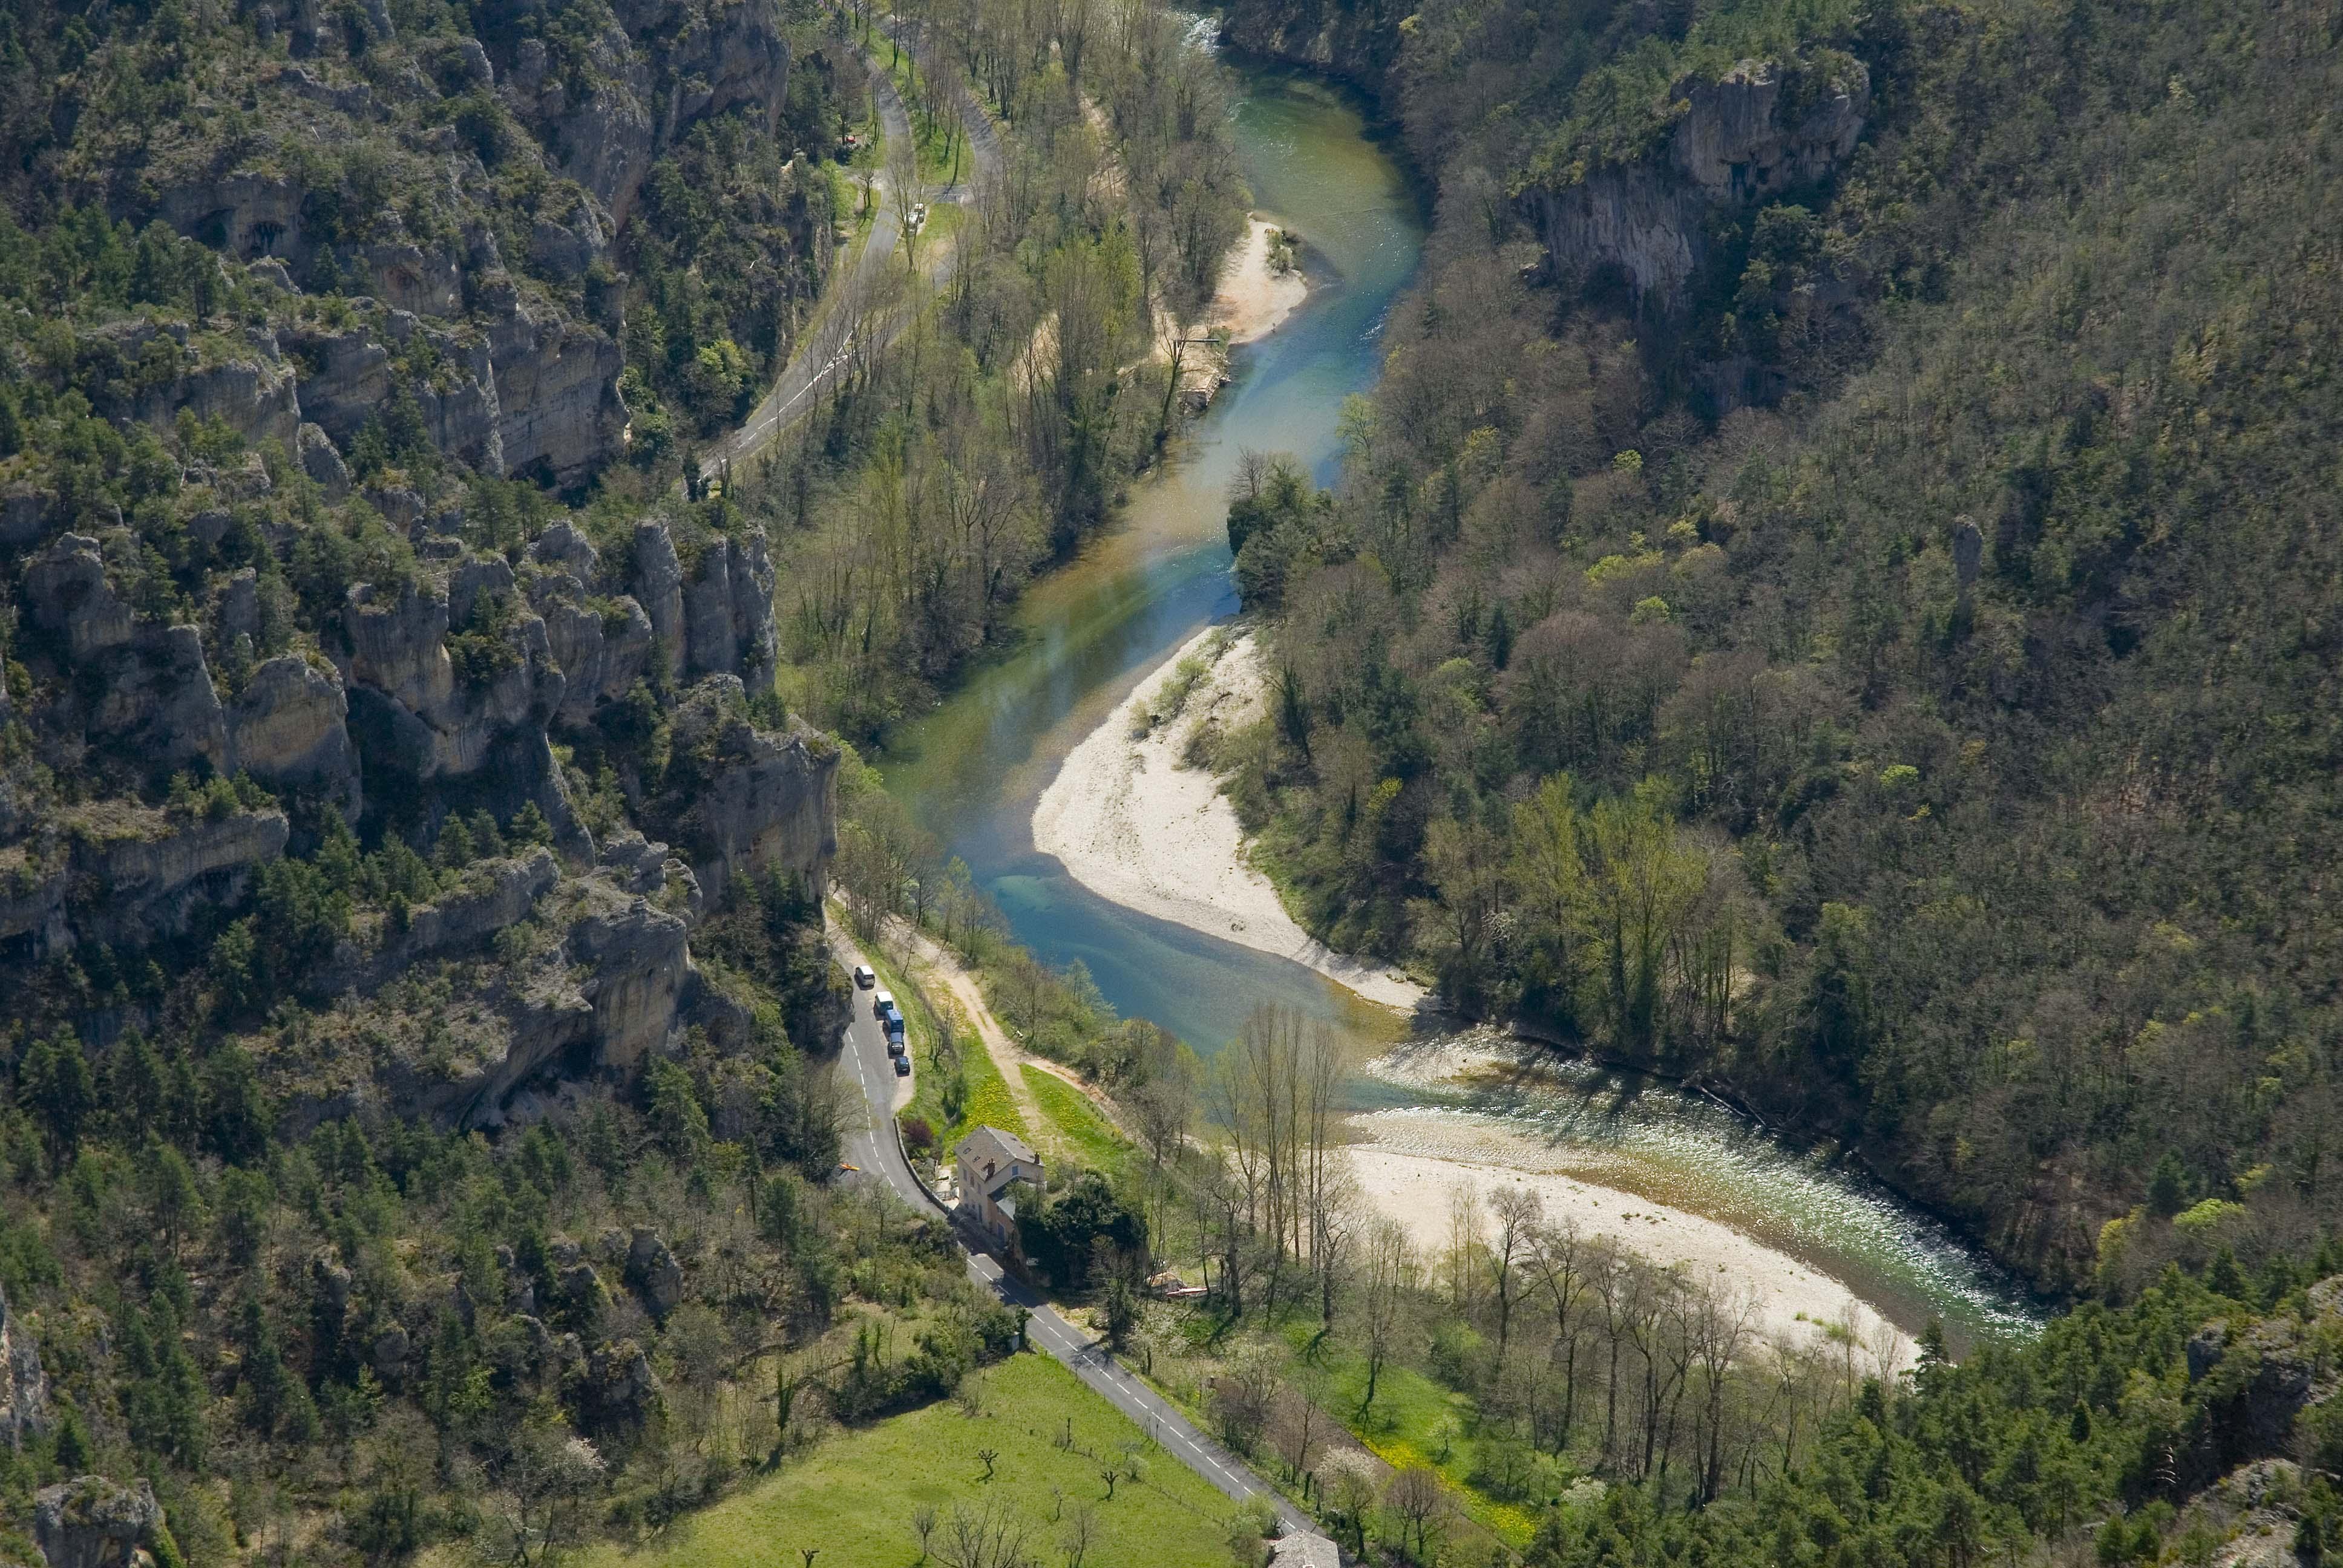 _JF12667-Gorges du Tarn-Point sublime